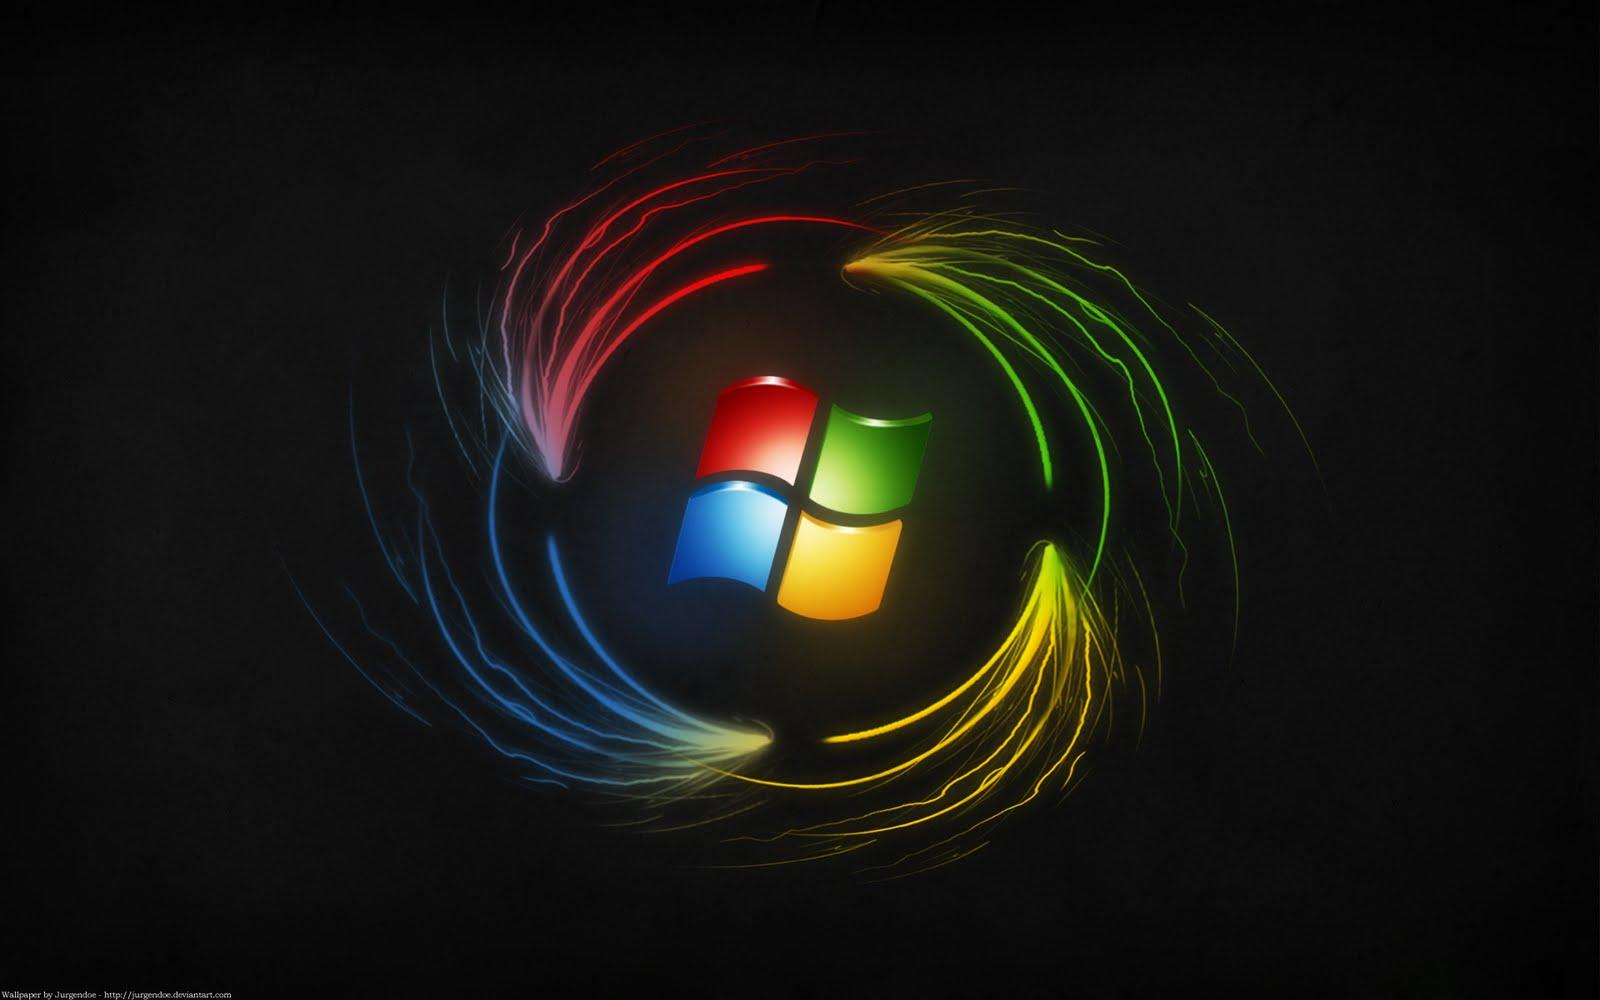 47+] Hack Wallpaper Windows 8 on WallpaperSafari